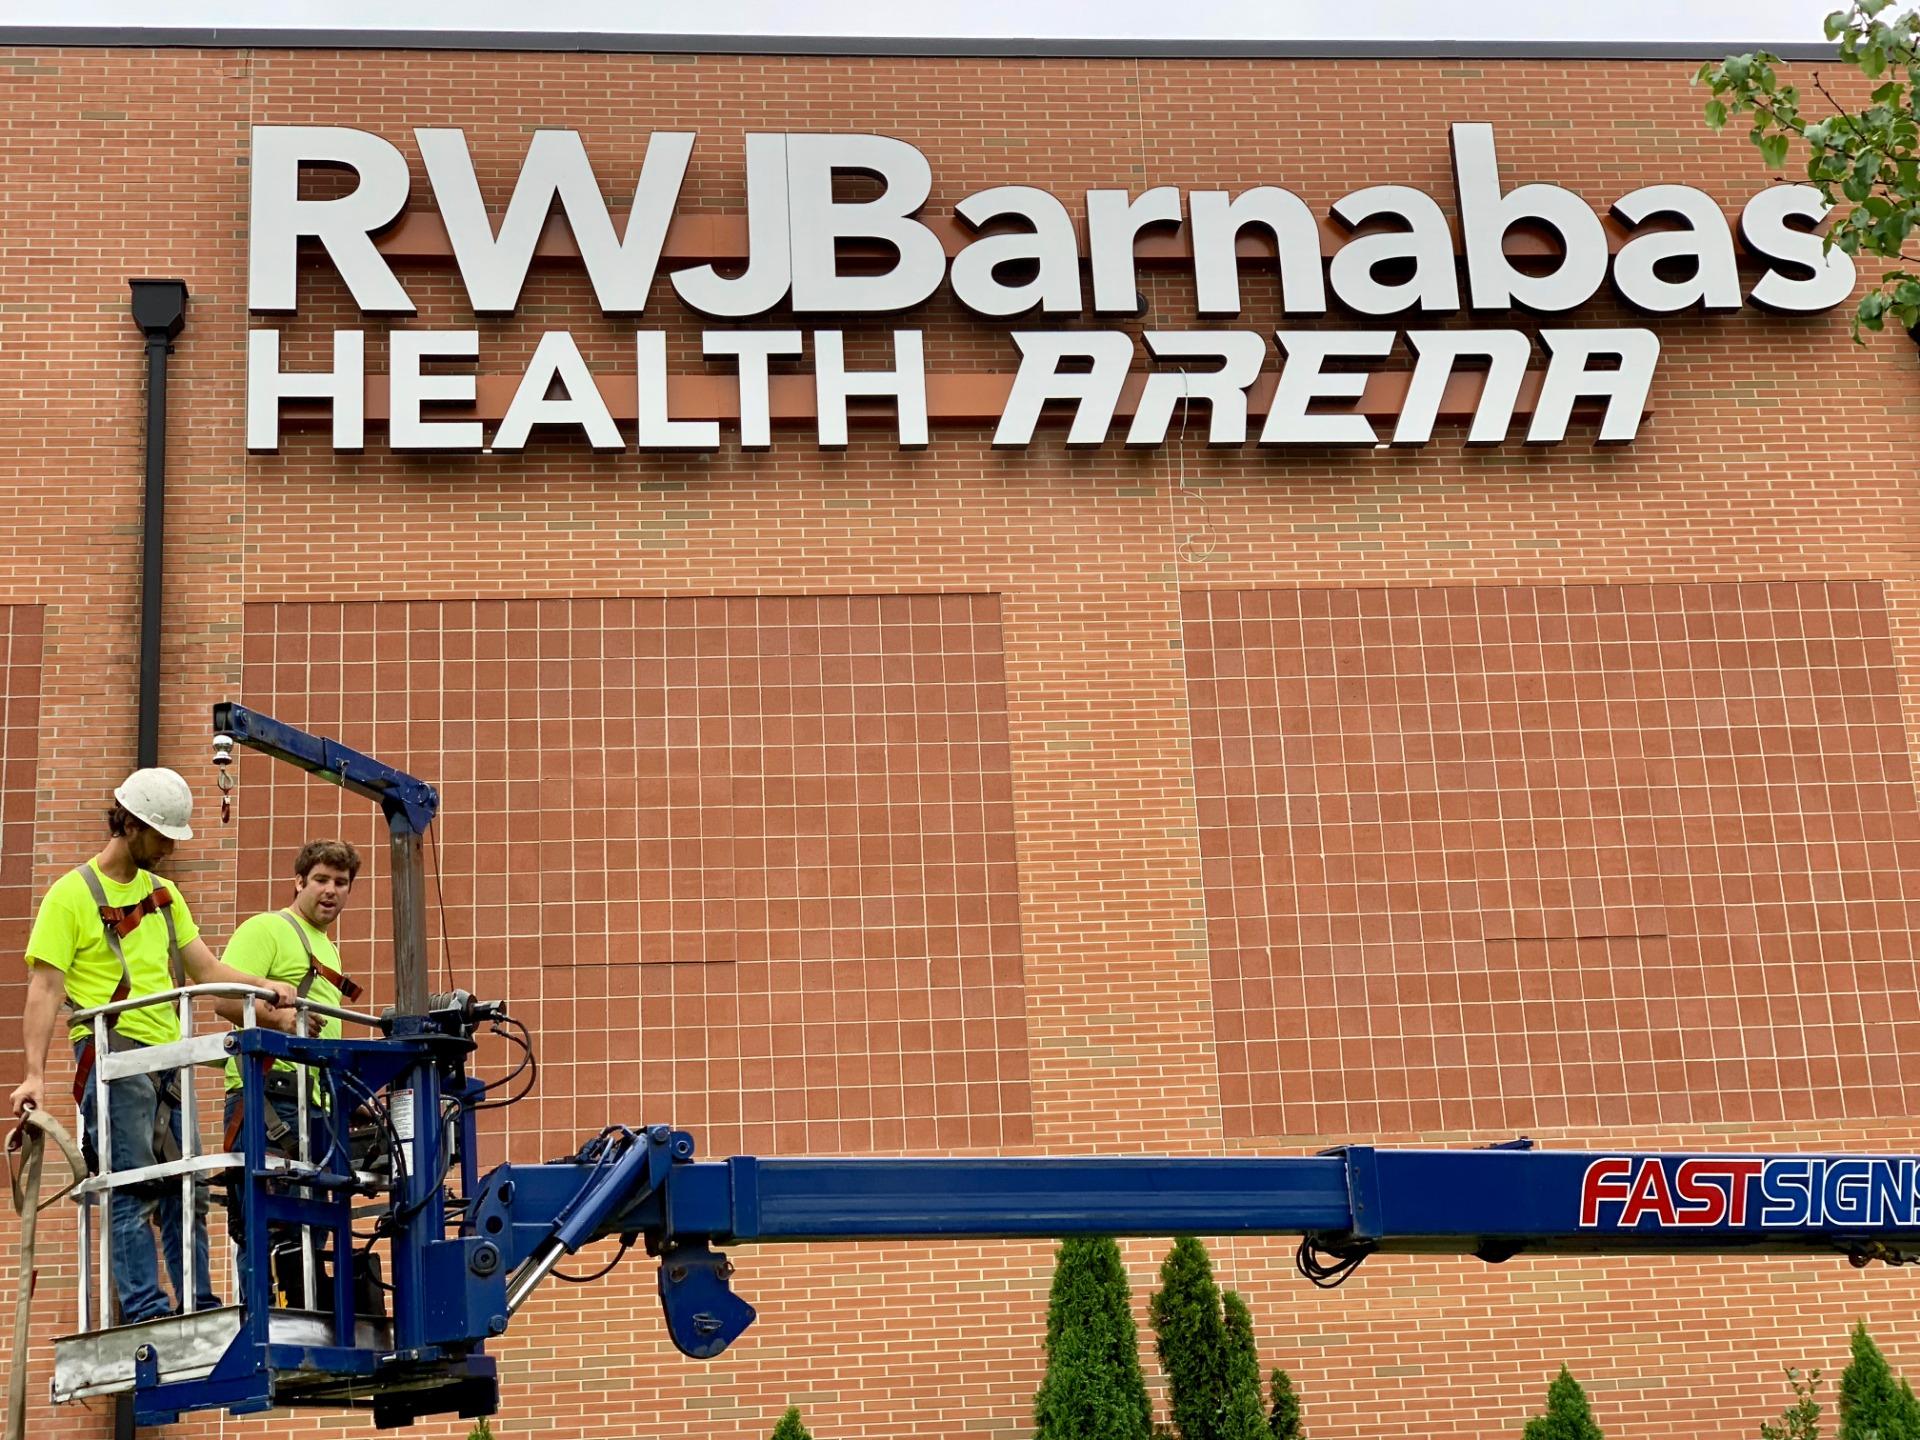 RWJBarnabas Health Arena